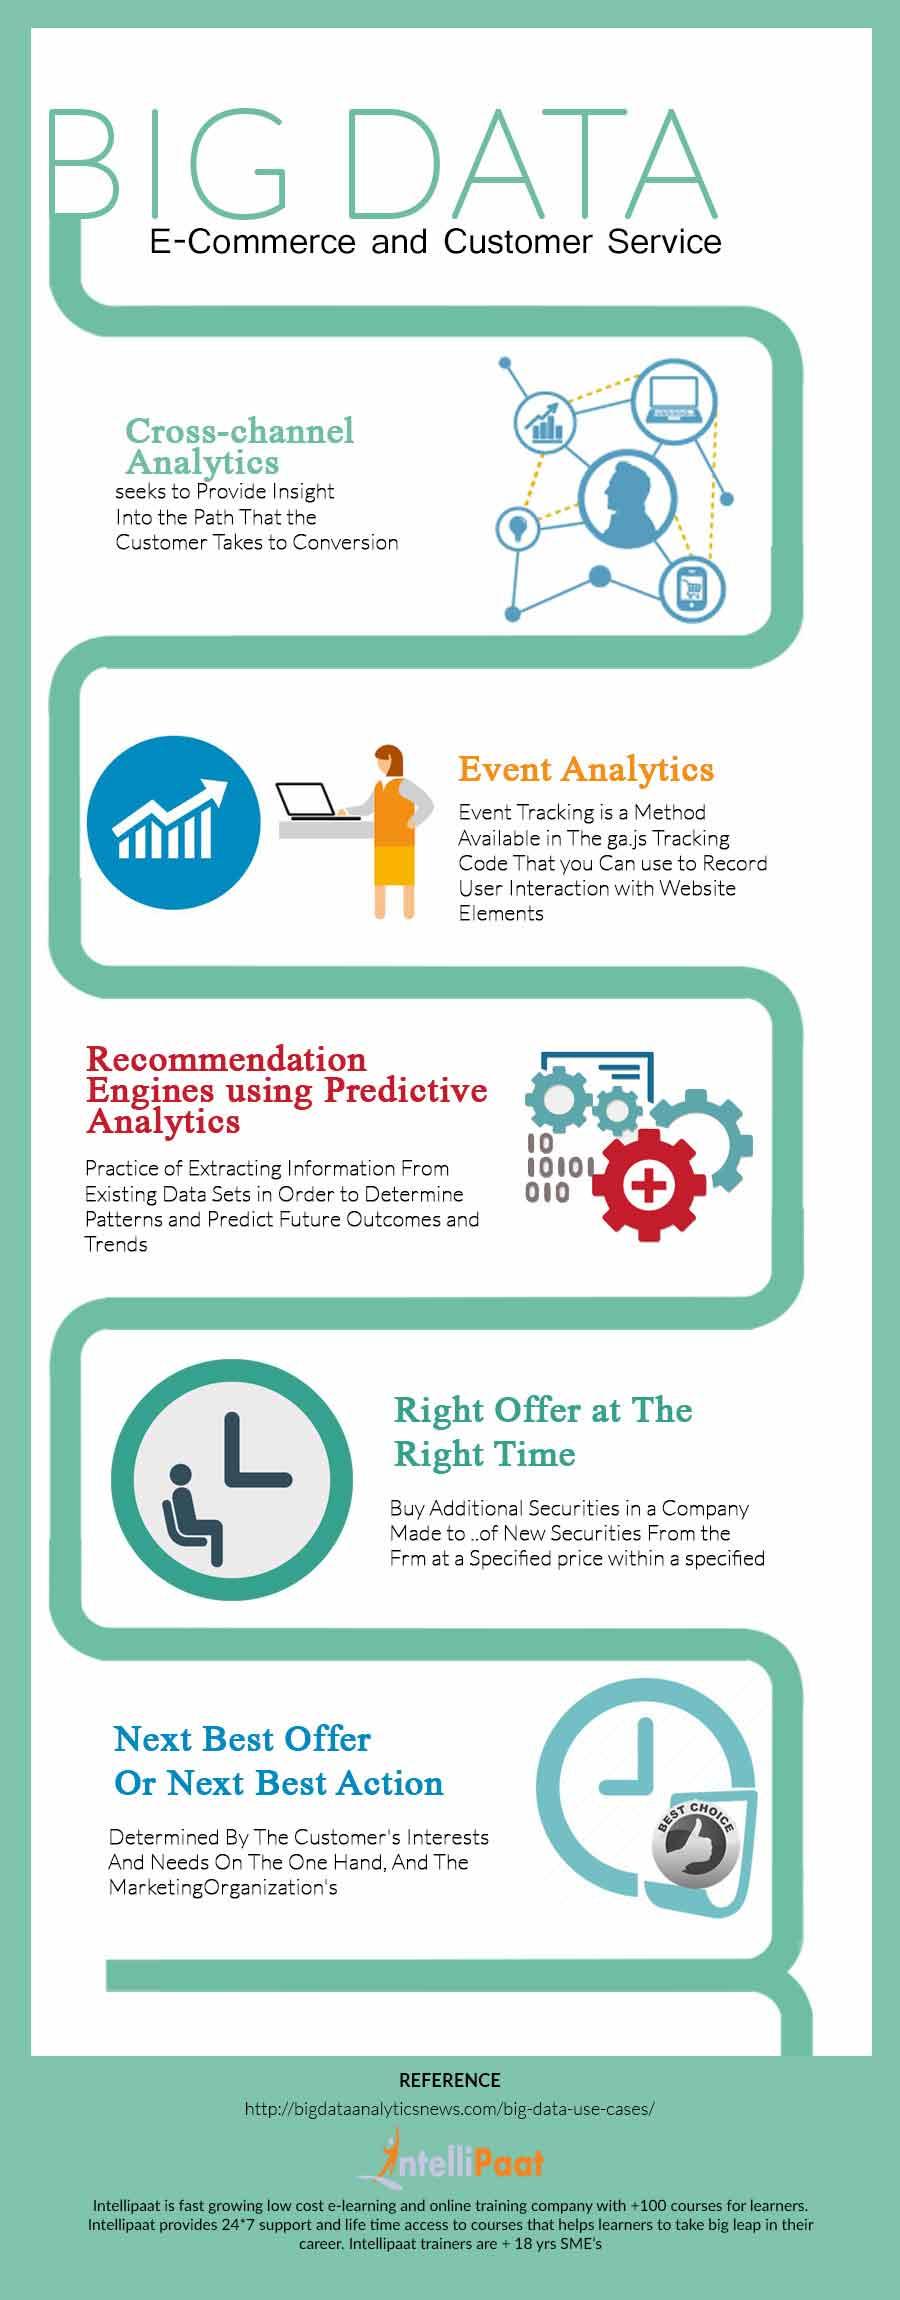 Big-Data-E-Commerce-and-Customer-Service